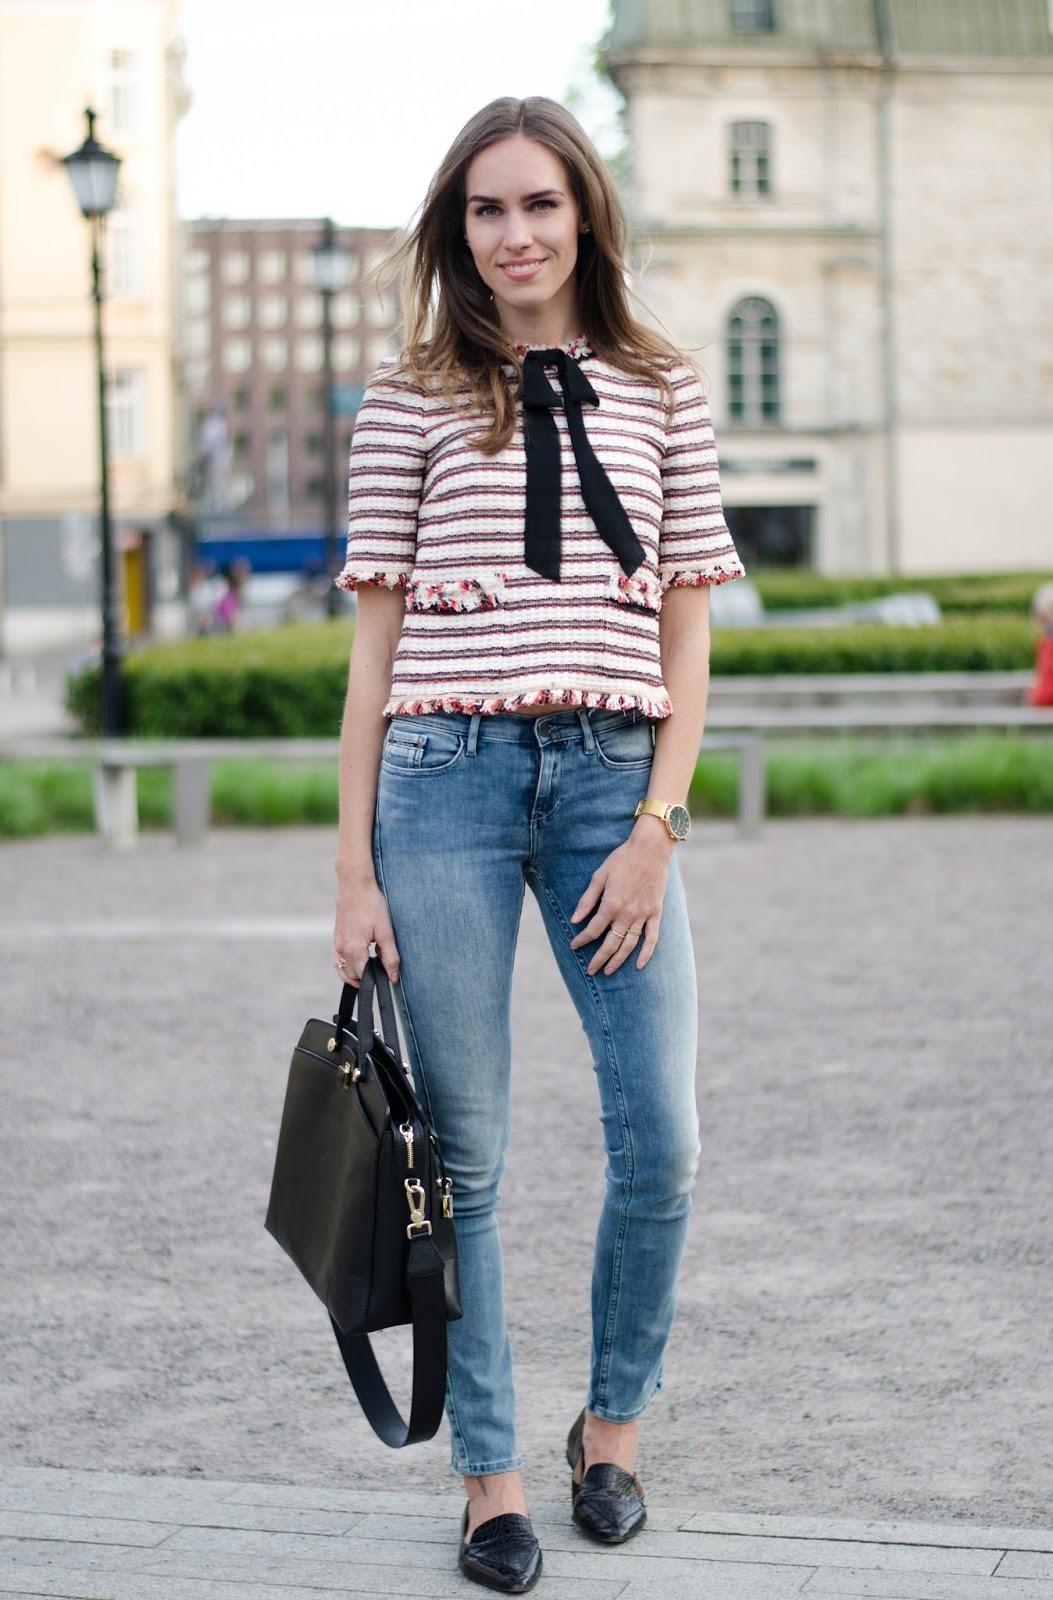 kristjaana mere zara top calvin klein jeans spring outfit fashion